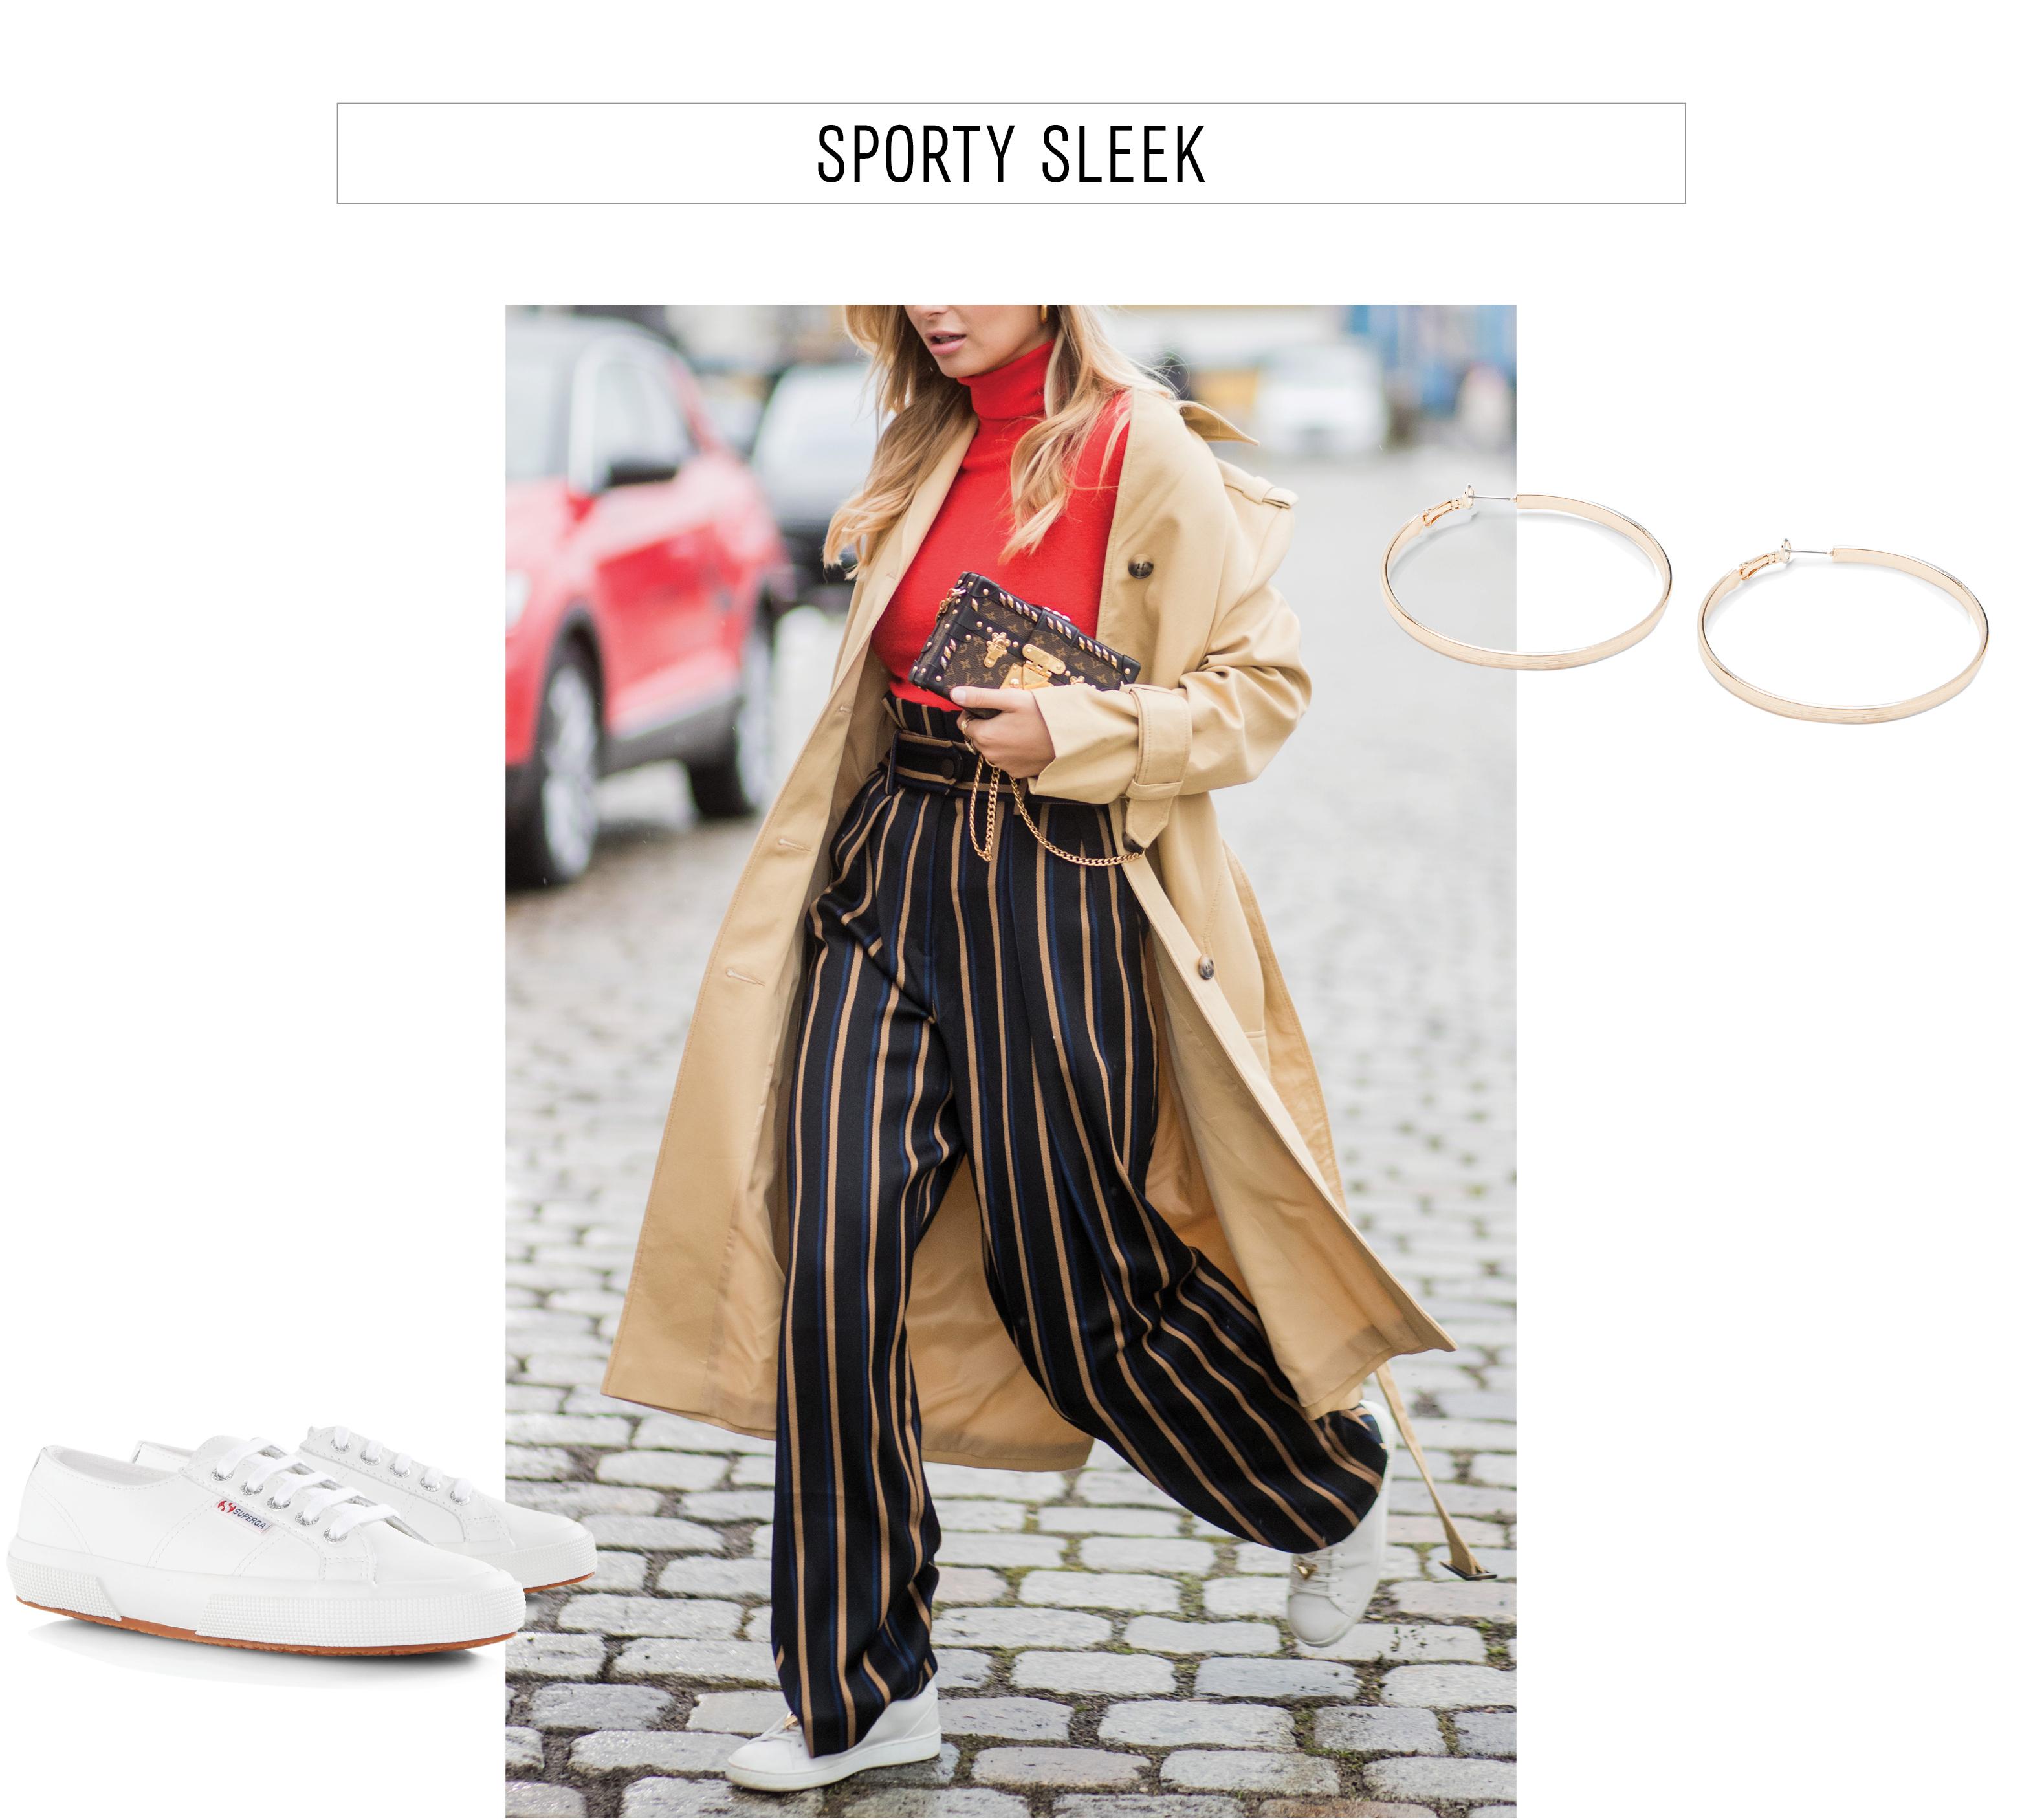 womens-dress-pants-sporty-sleek